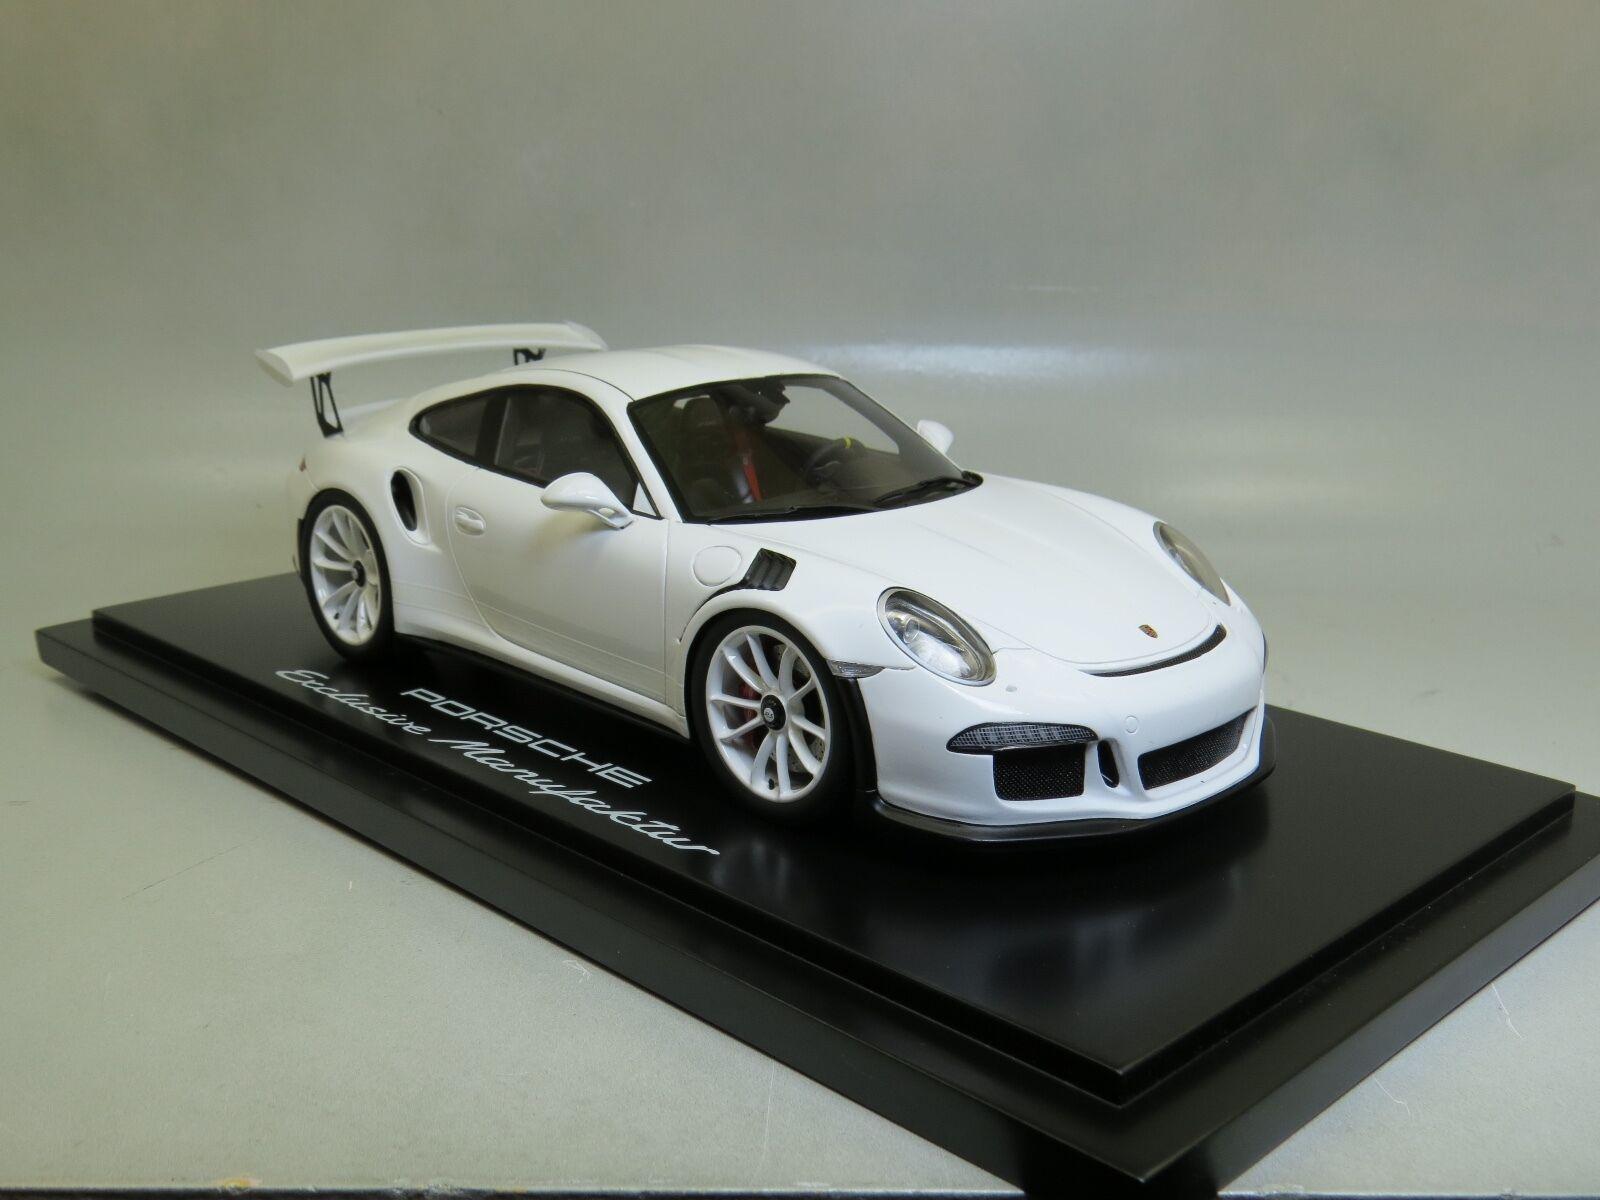 Porsche 911 991 Gt3 Rs Coupe IAA 2015 bianca Spark 1/18 1:18 WAX02100018